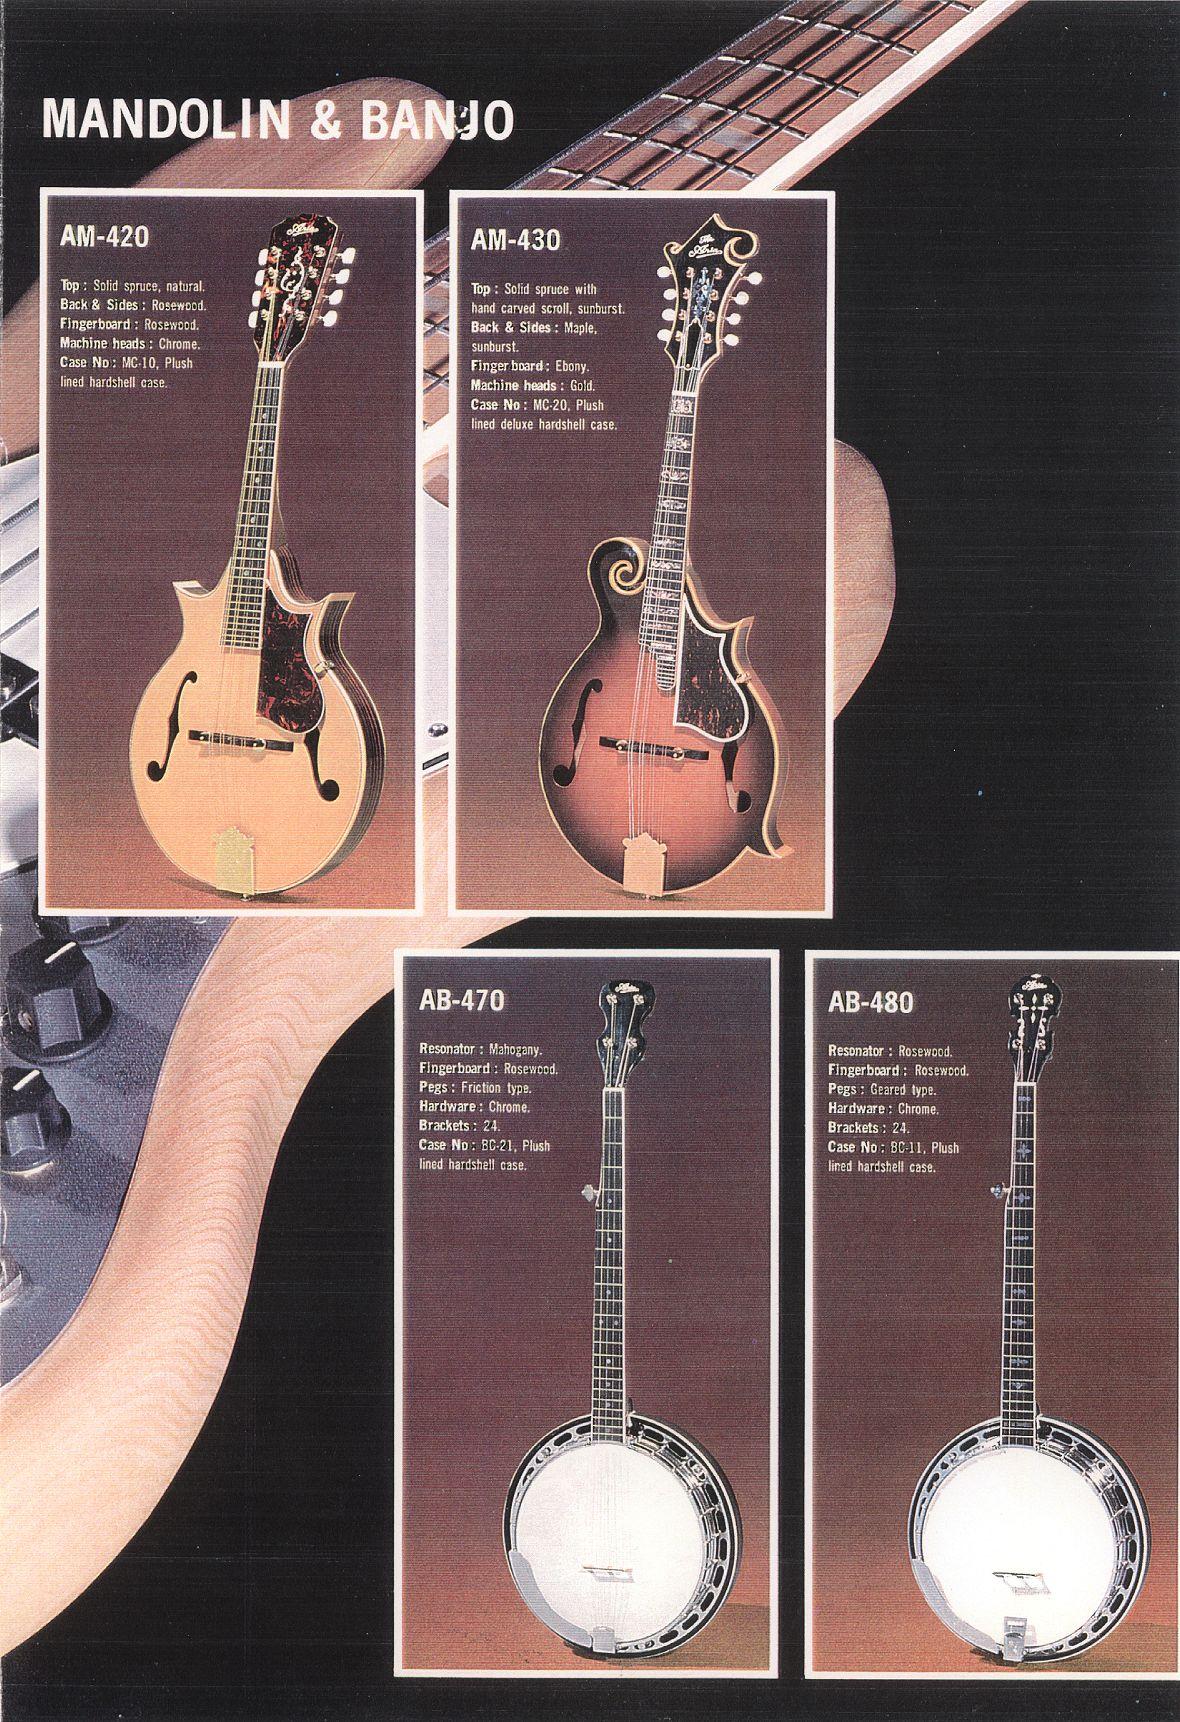 aria banjo mandolin pg1